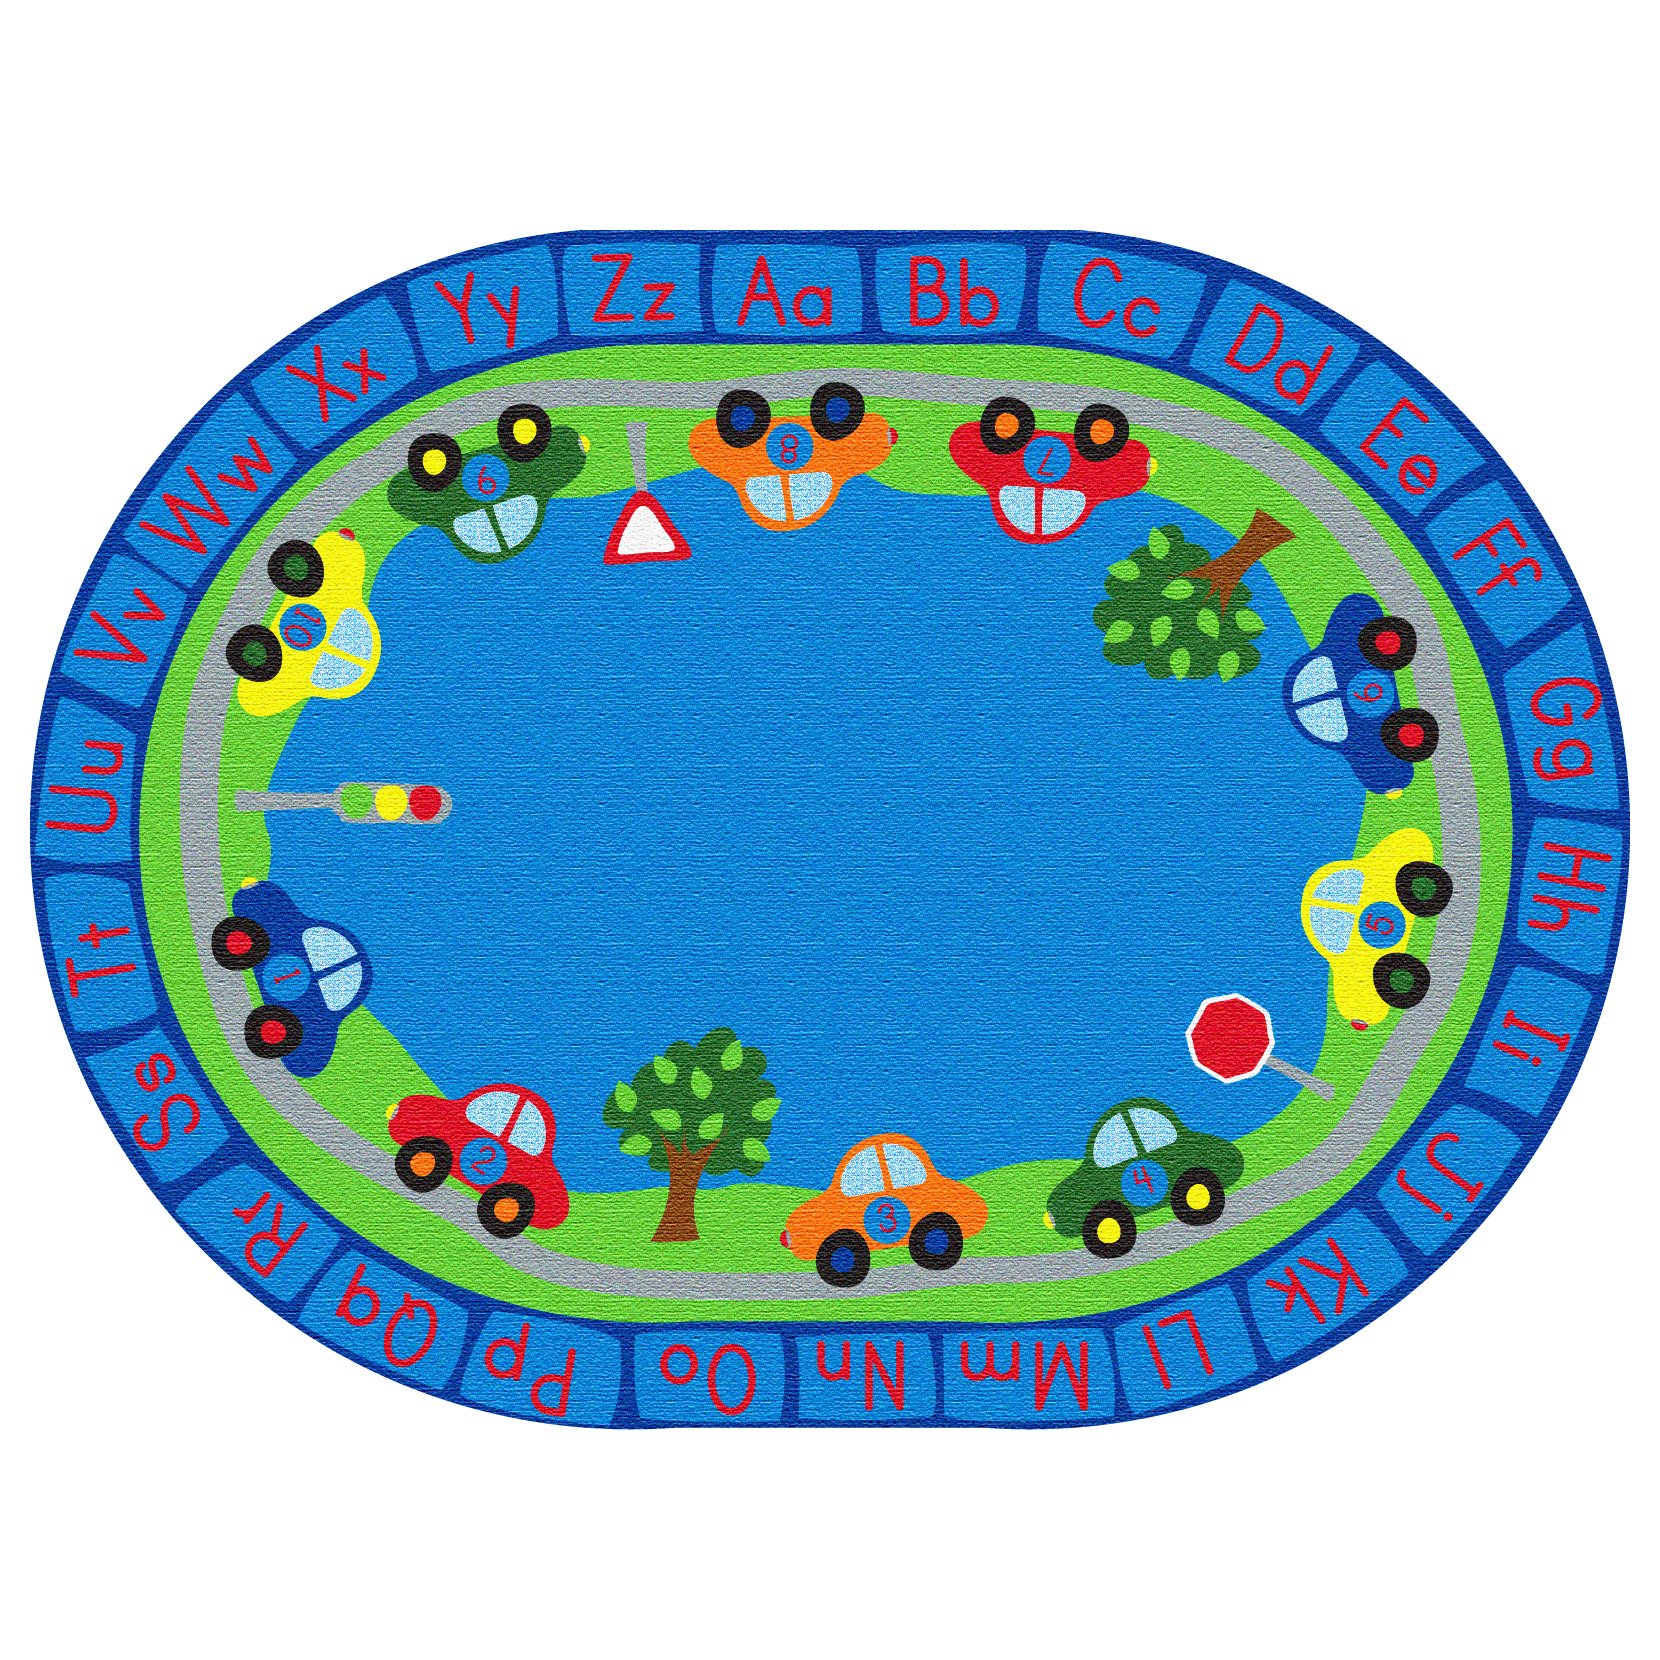 ECR4Kids All Around Cars Educational Alphabet Rug for Children, School Classroom Learning Carpet, Oval, 6 x 9-Feet